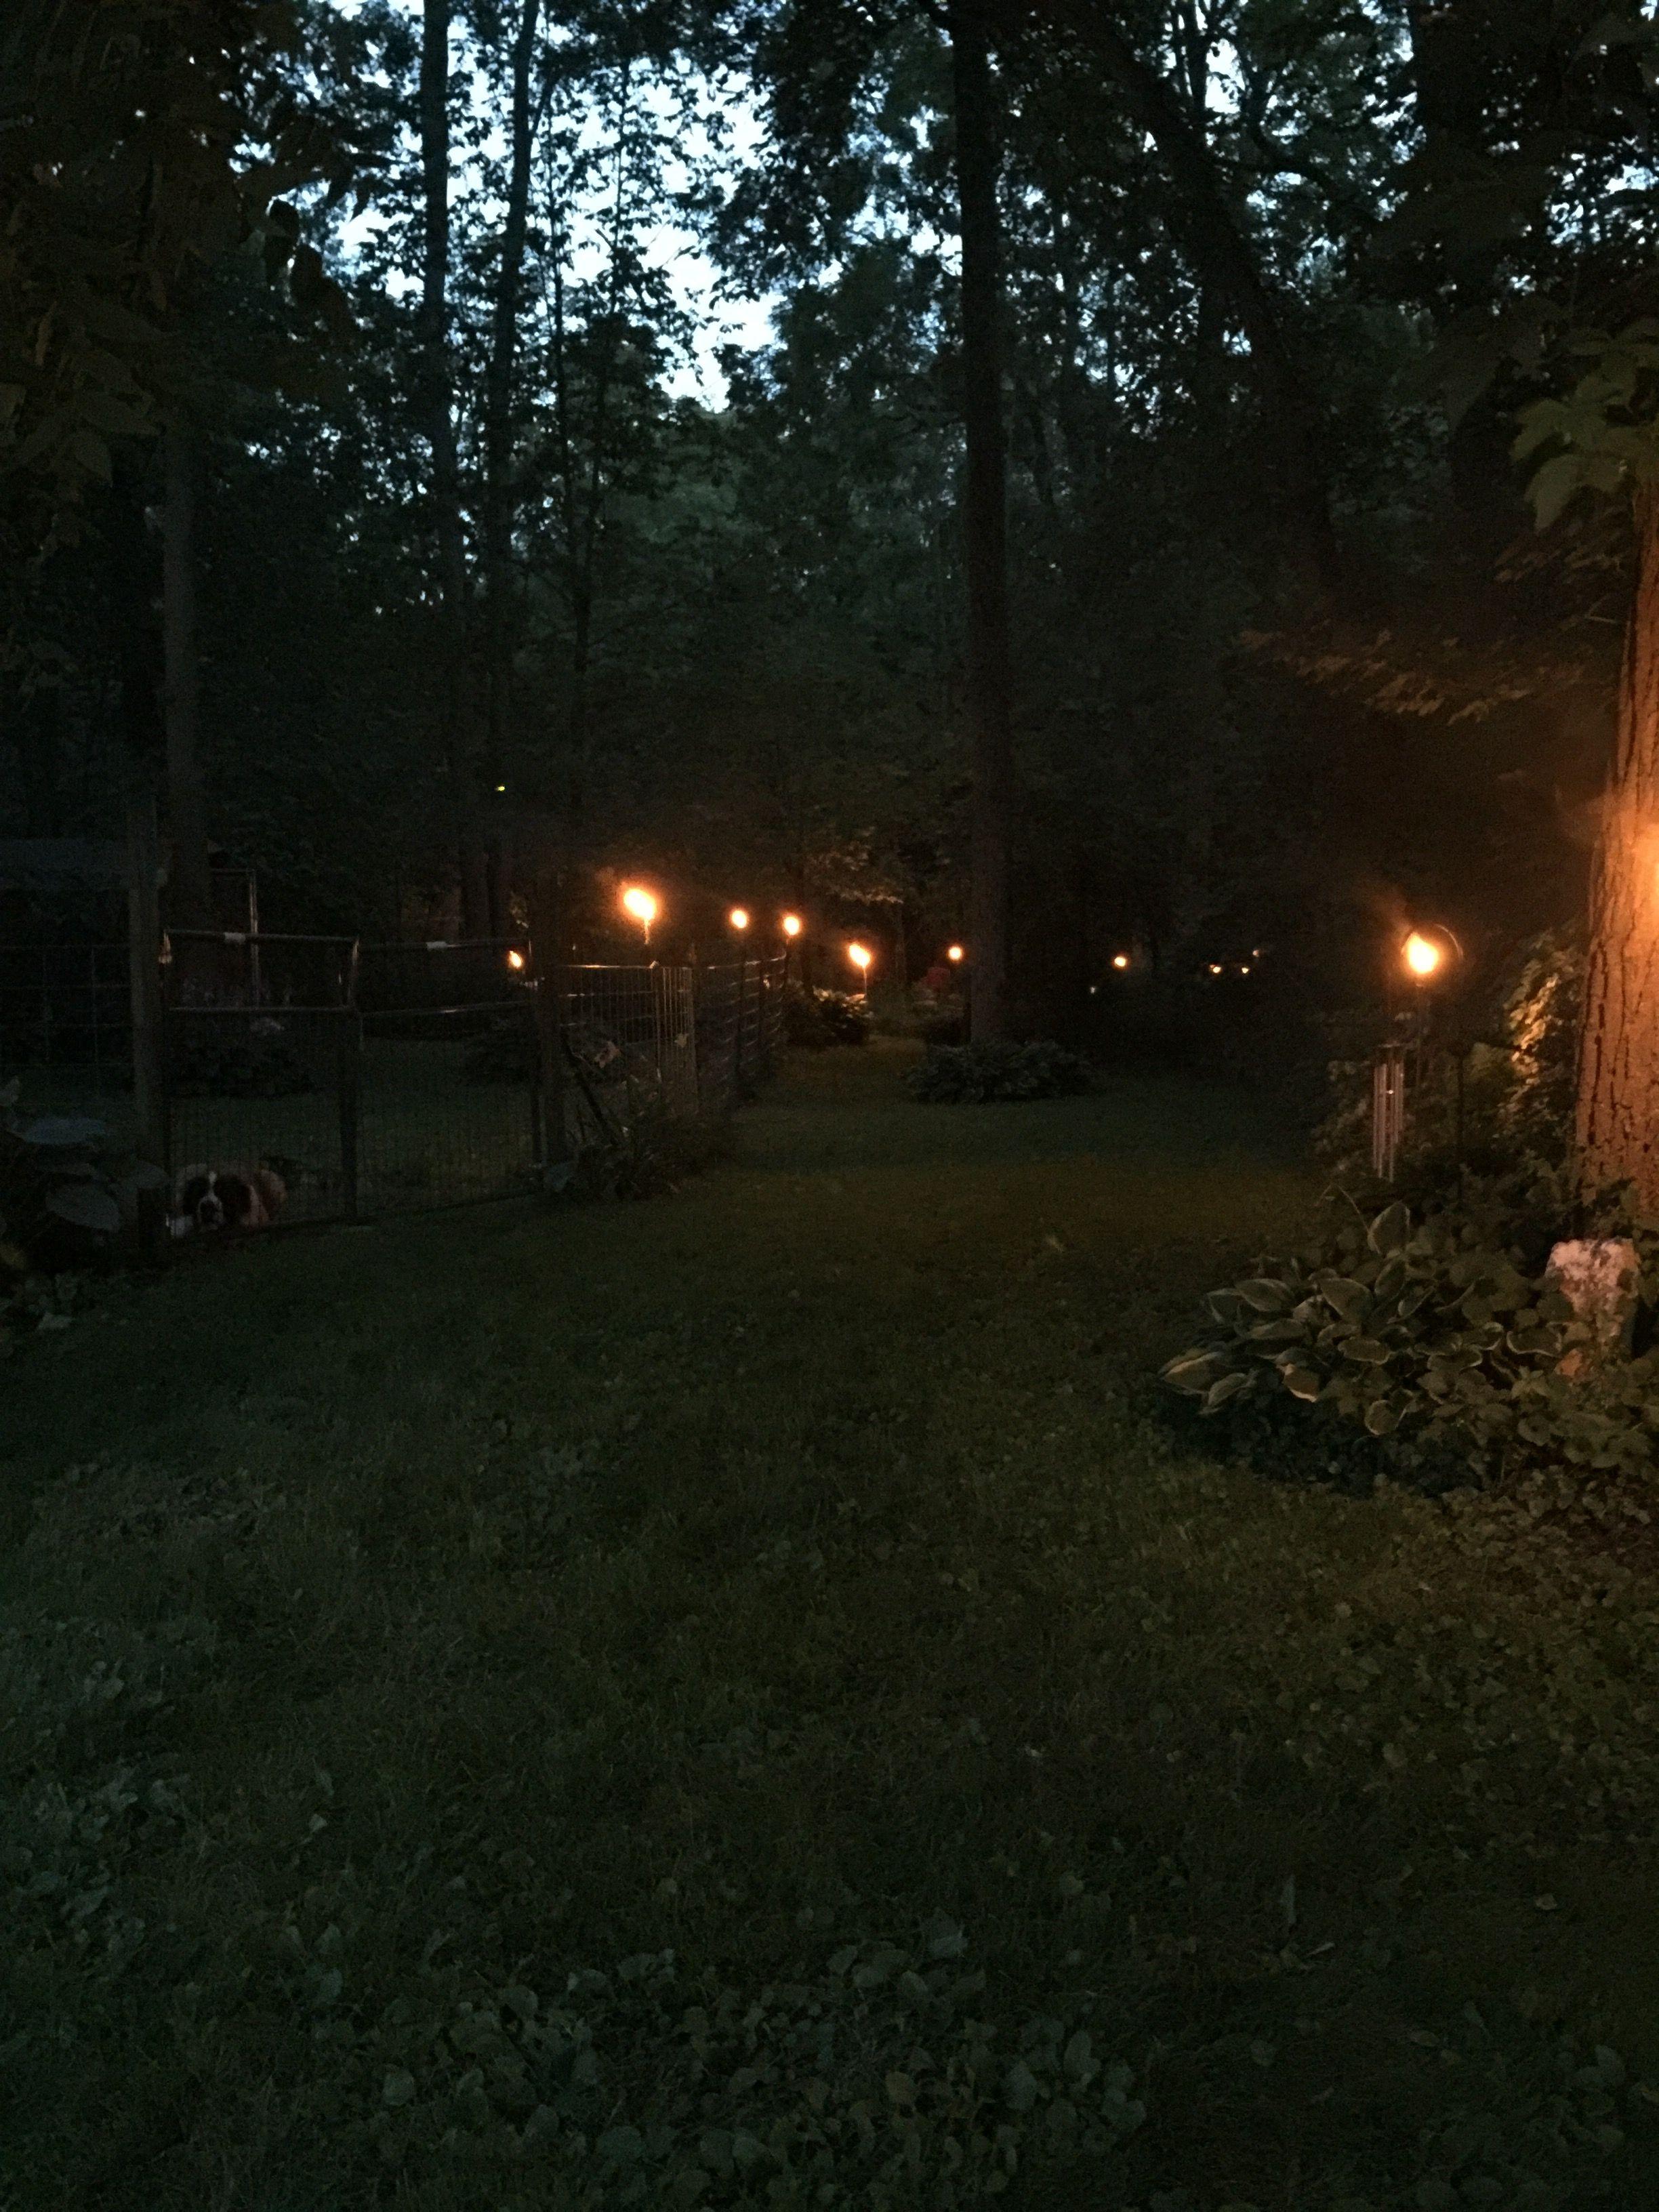 Tiki light pathway to the bonfire